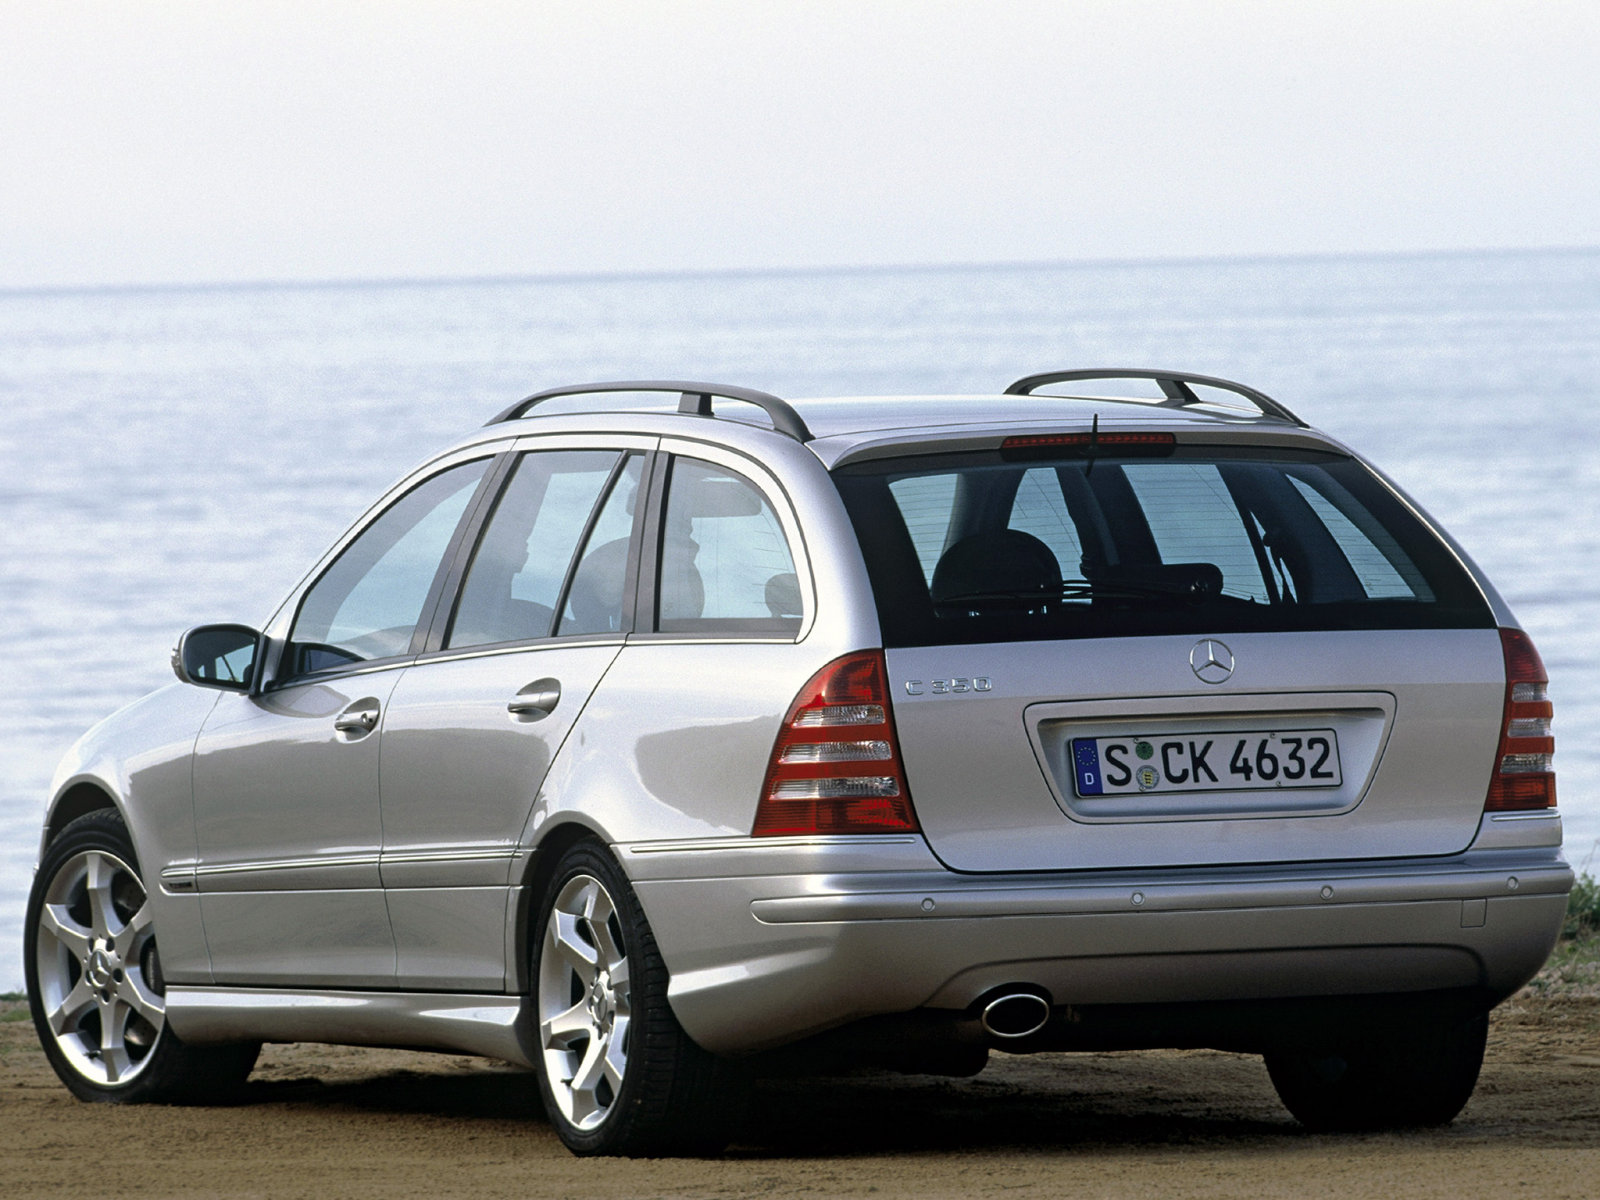 Mercedes-Benz (Мерседес-Бенц) C-class Combi (S203) 2004-2007 г.